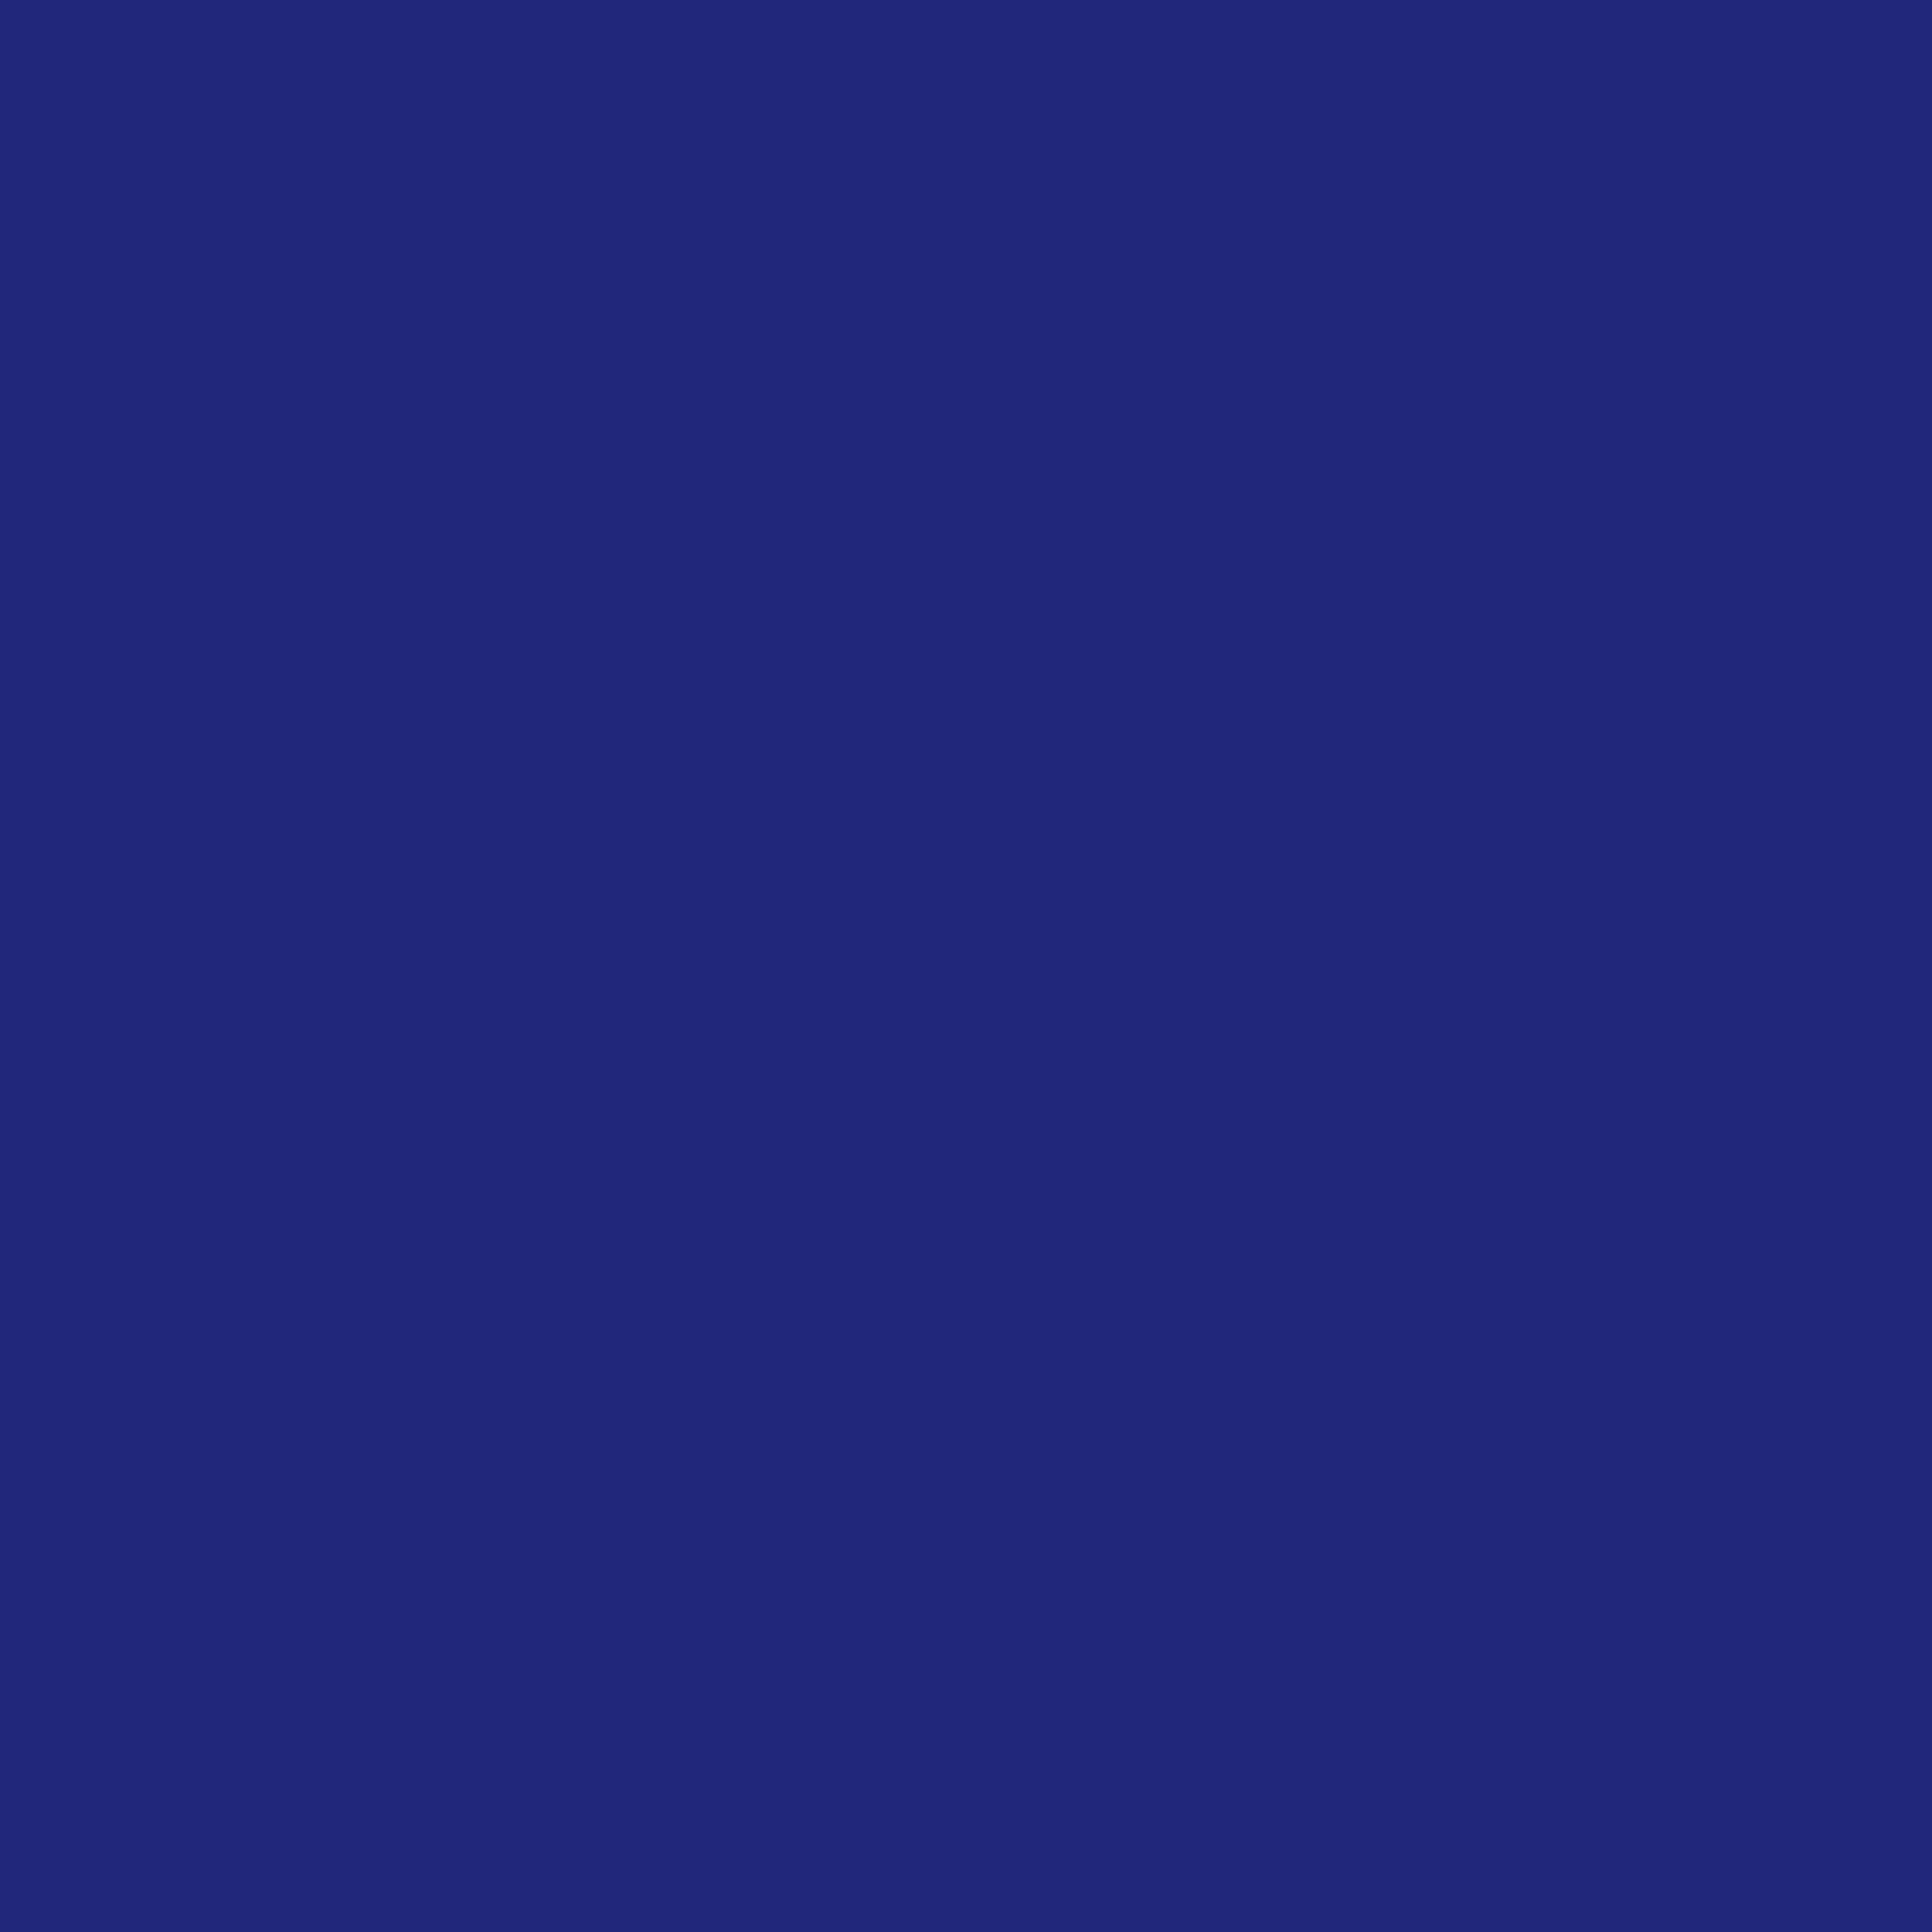 3600x3600 St Patricks Blue Solid Color Background